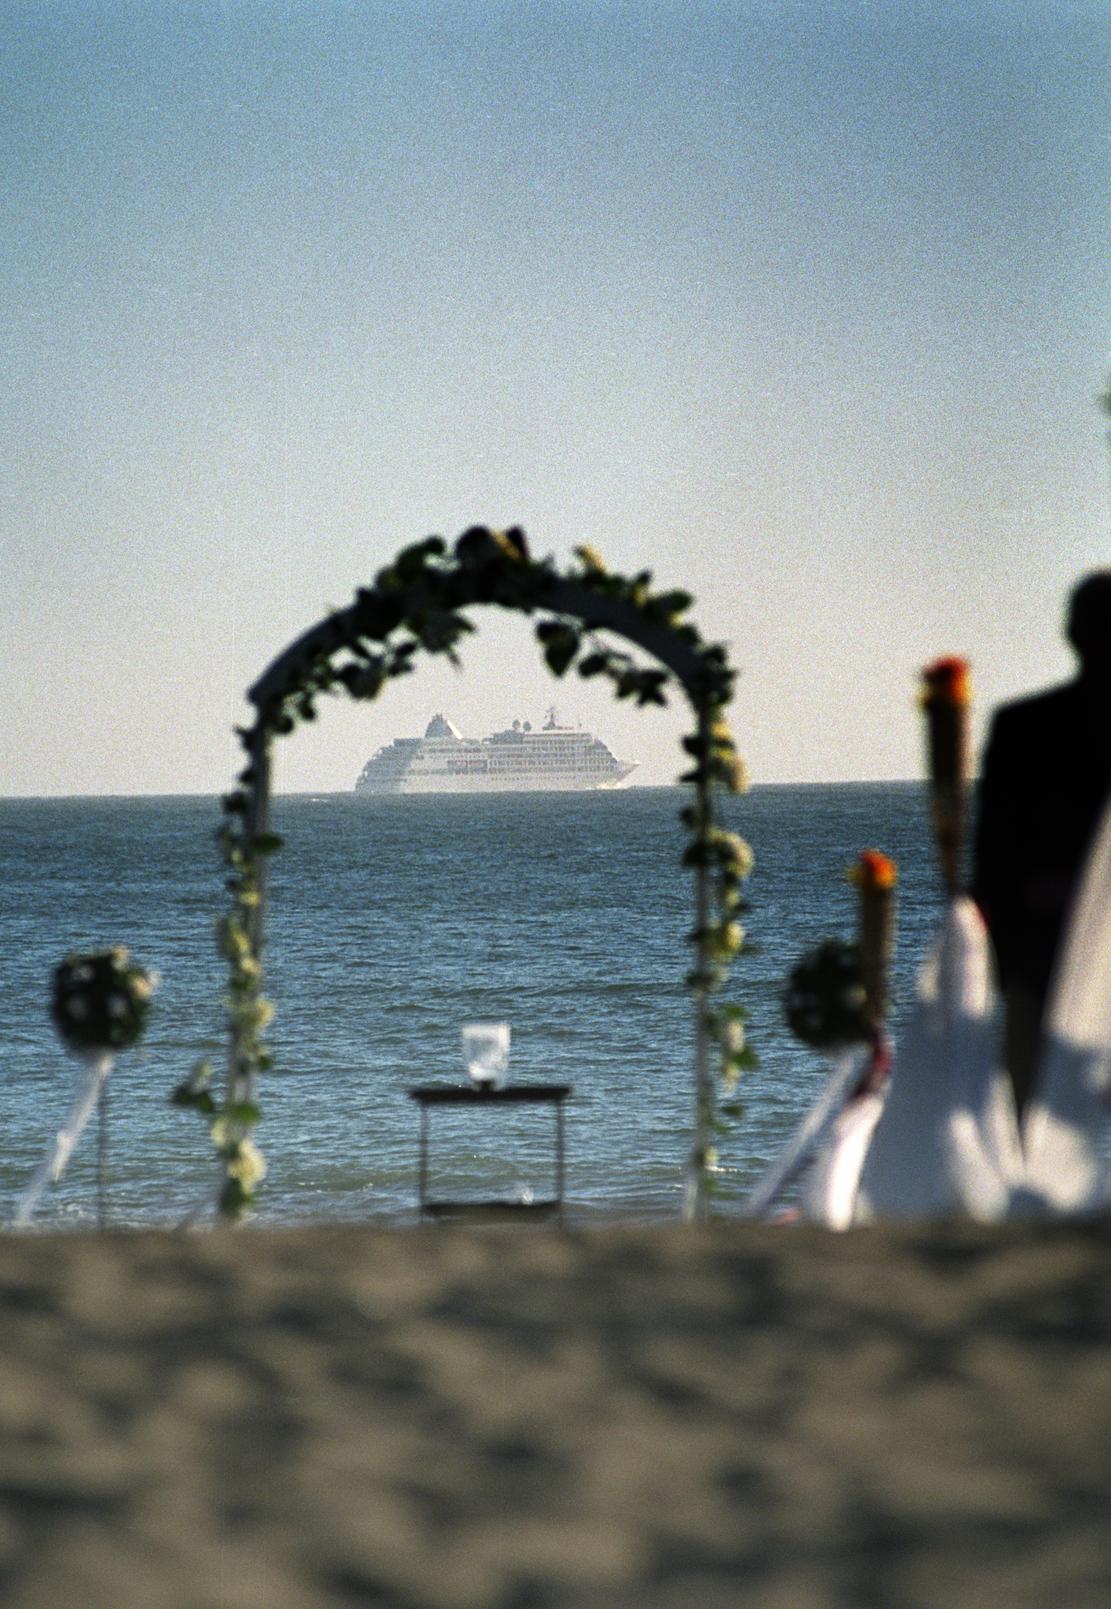 wedding_ship.jpg